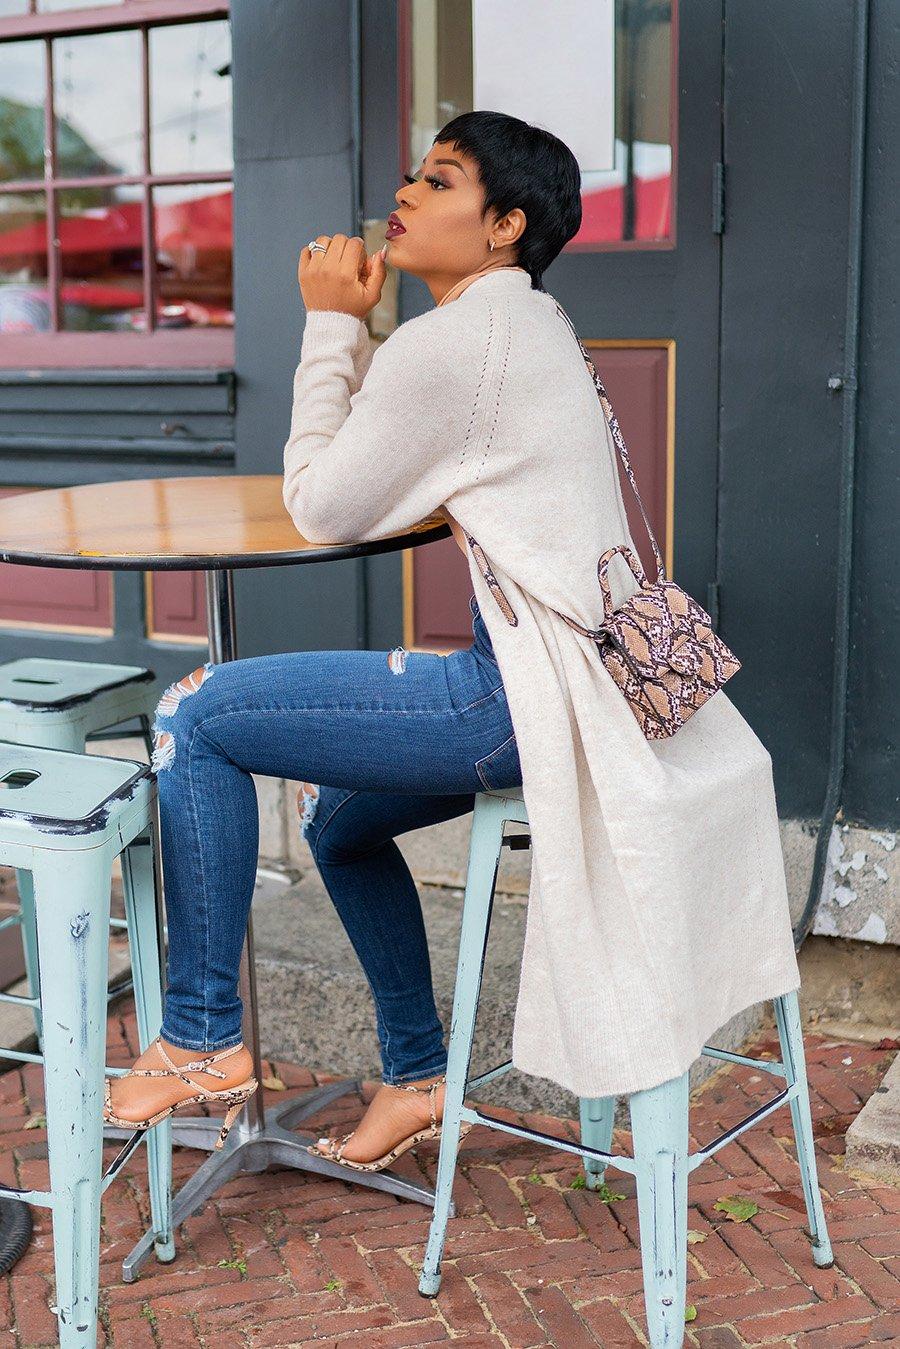 stella-adewunmi-of-jadore-fashion-blog-shares-affordable-fall-trends-cardigan-snakeskin